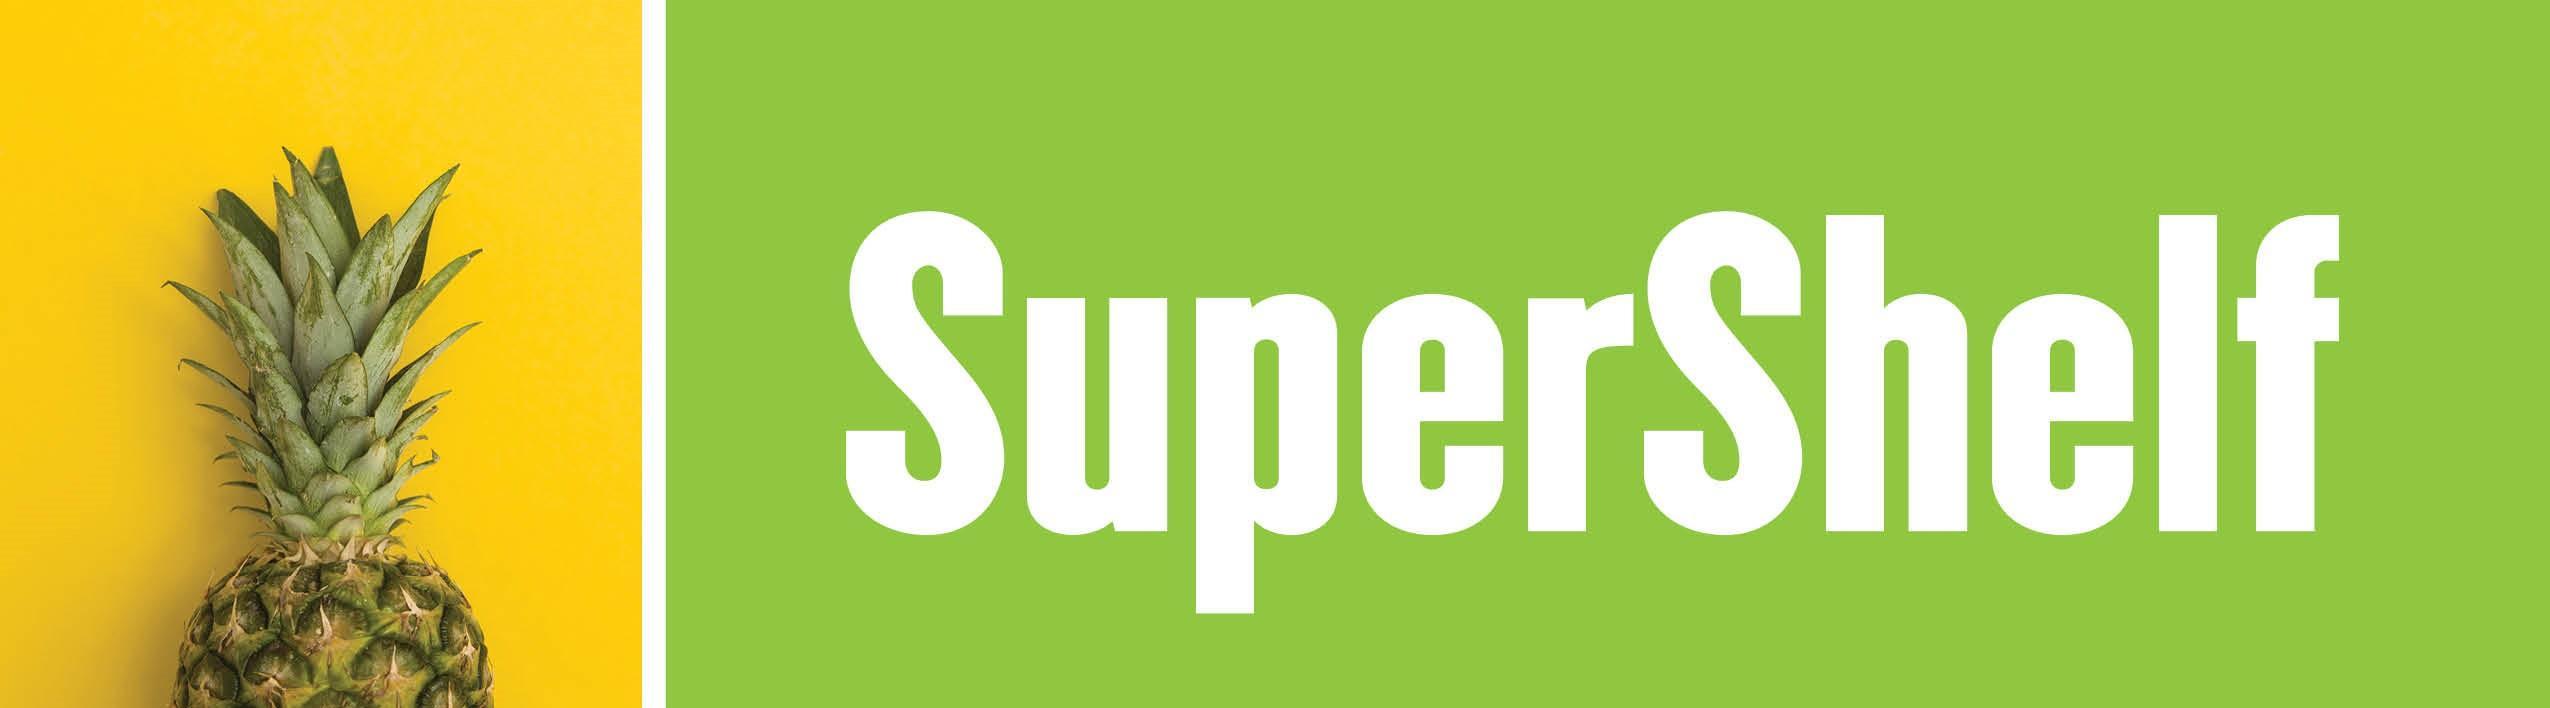 supershelf_header